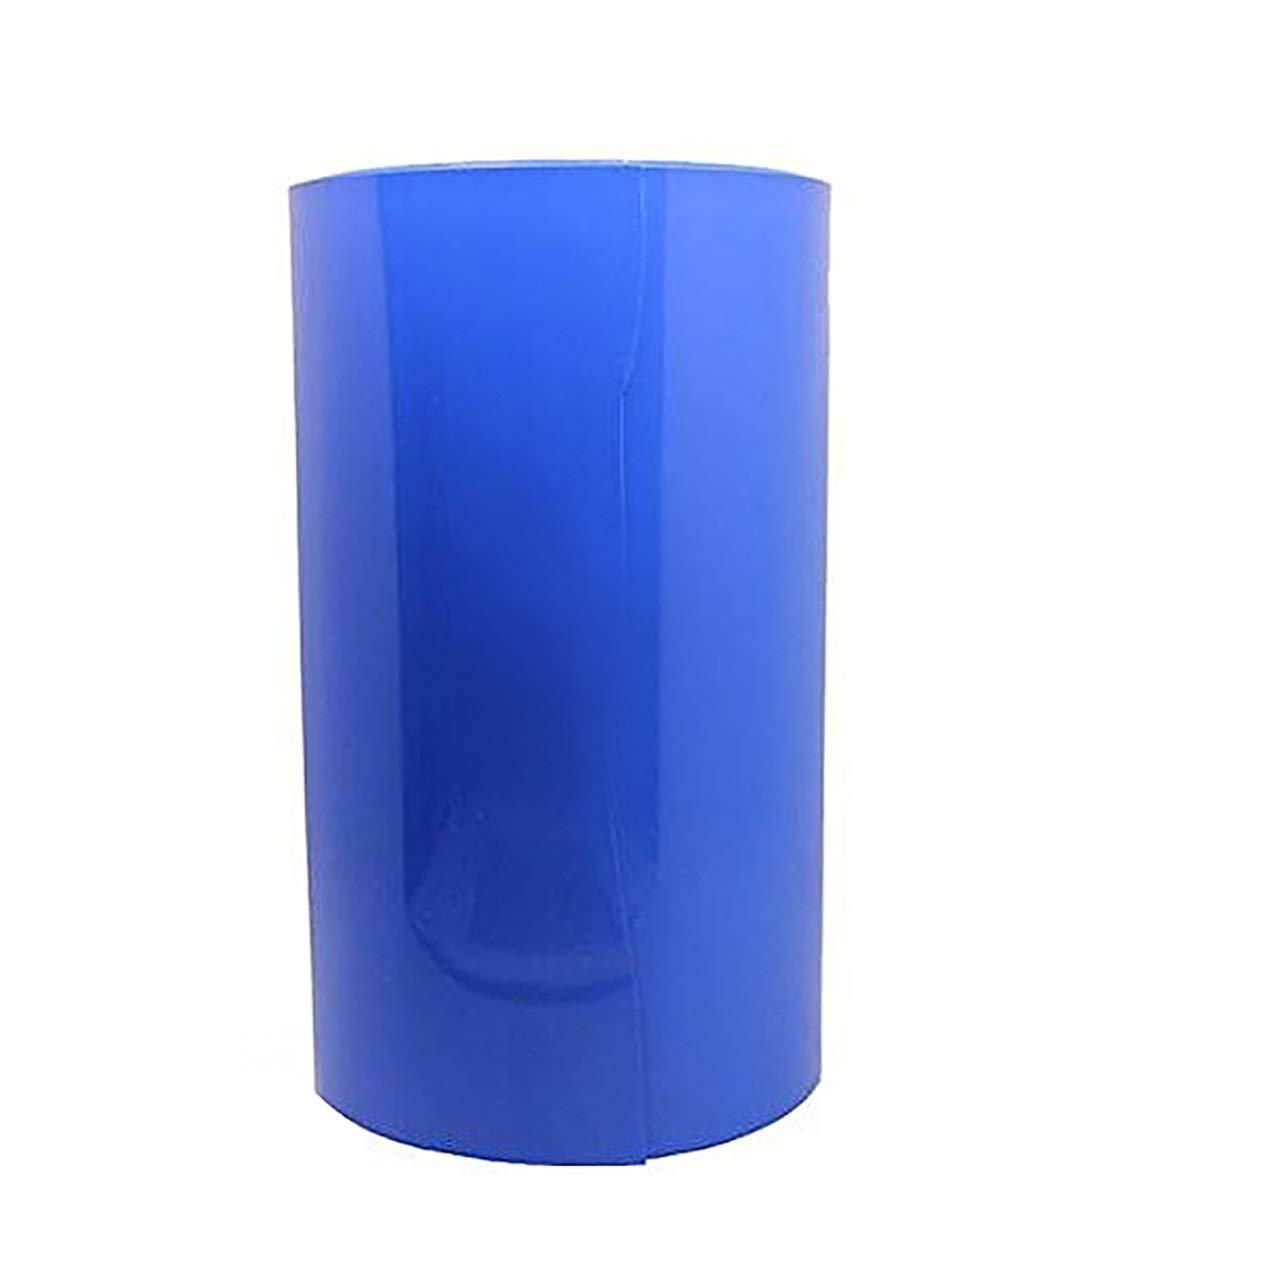 Eyourlife Blue DIY Battery Pack PVC Heat for Chicago Mall Shrink Wrap Recommended Tube Bi